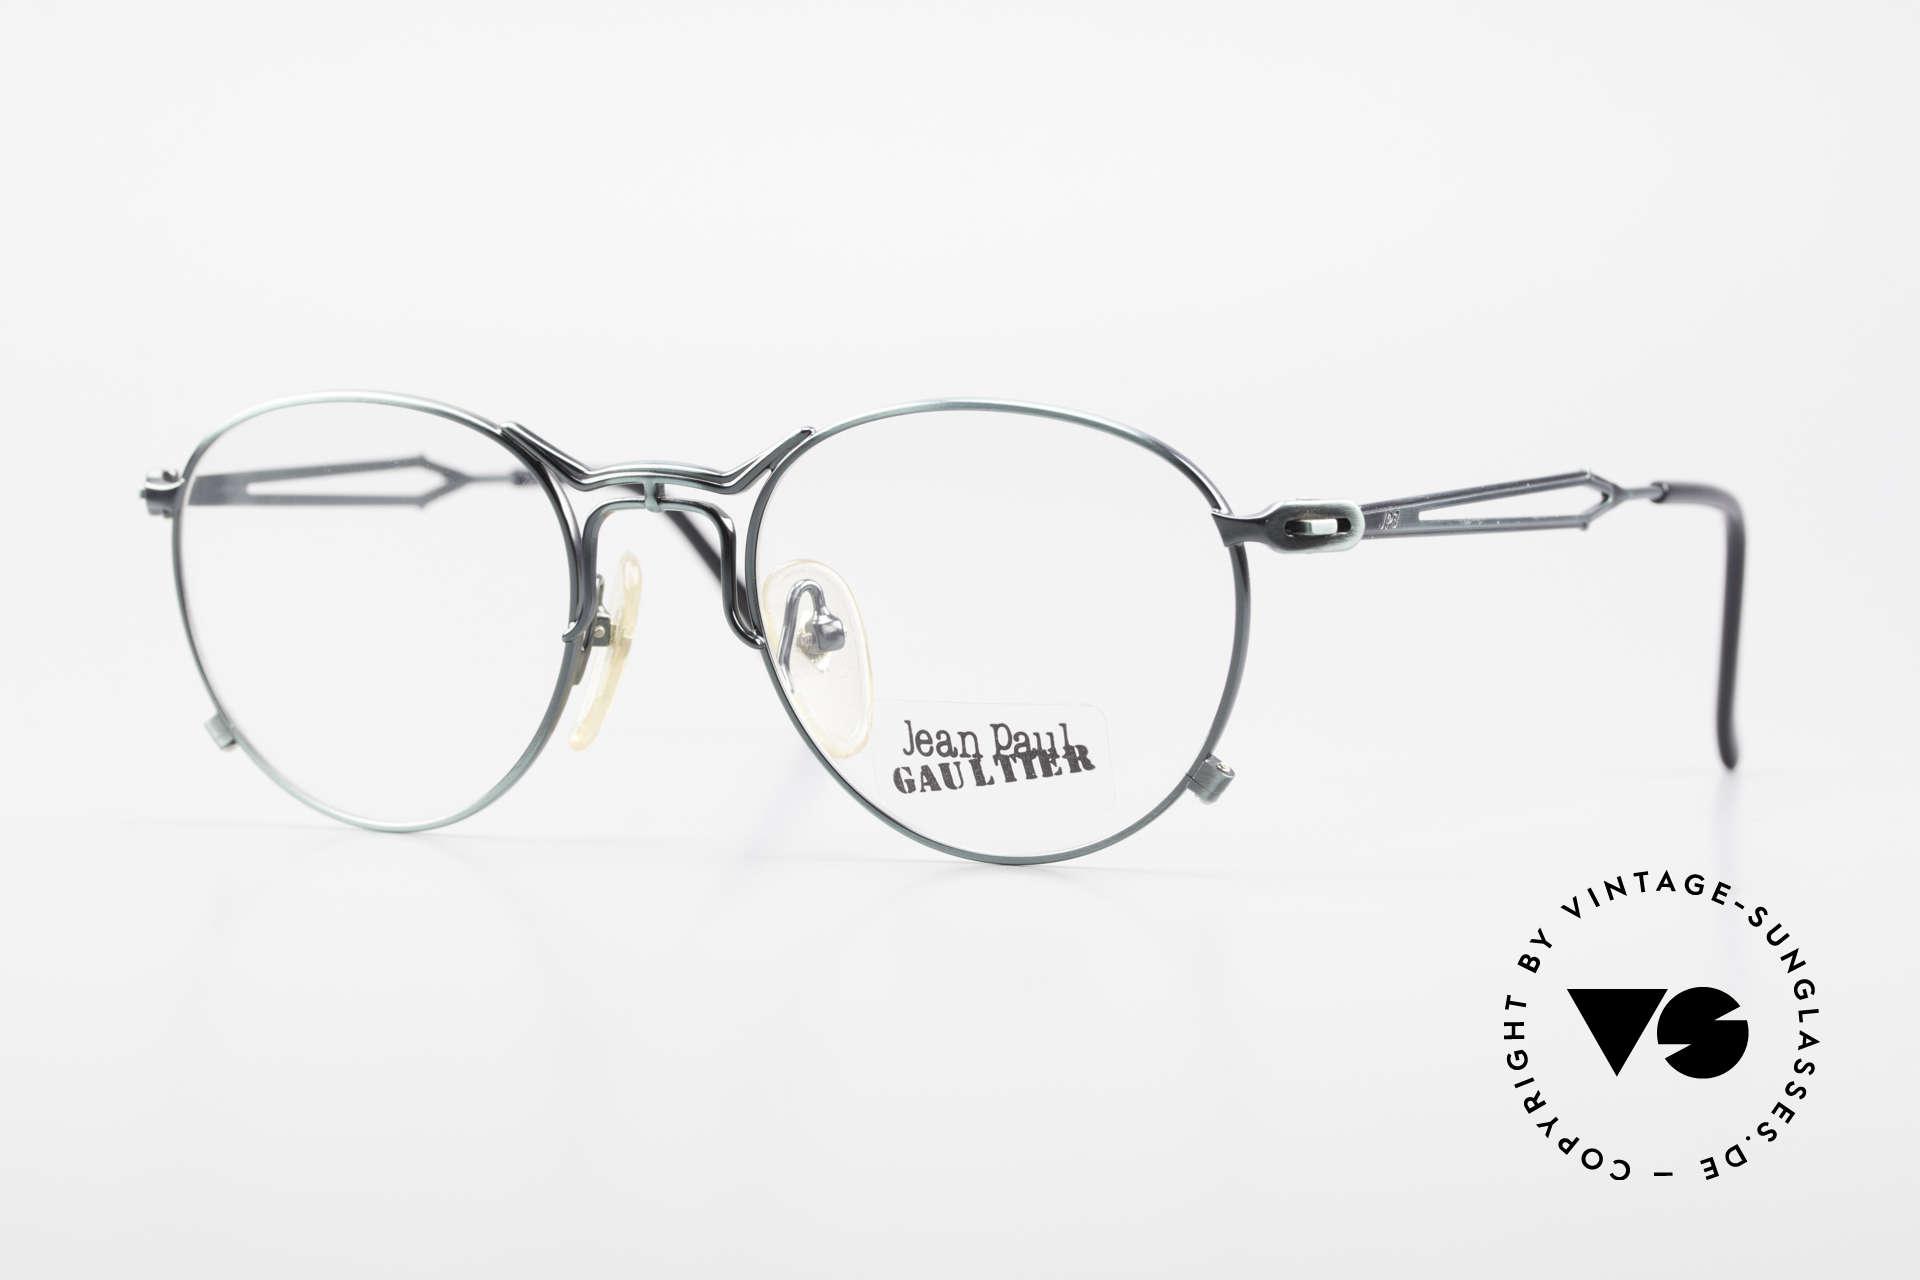 Jean Paul Gaultier 55-2177 Rare Designer Eyeglasses JPG, extraordinary vintage JP Gaultier designer eyeglasses, Made for Men and Women